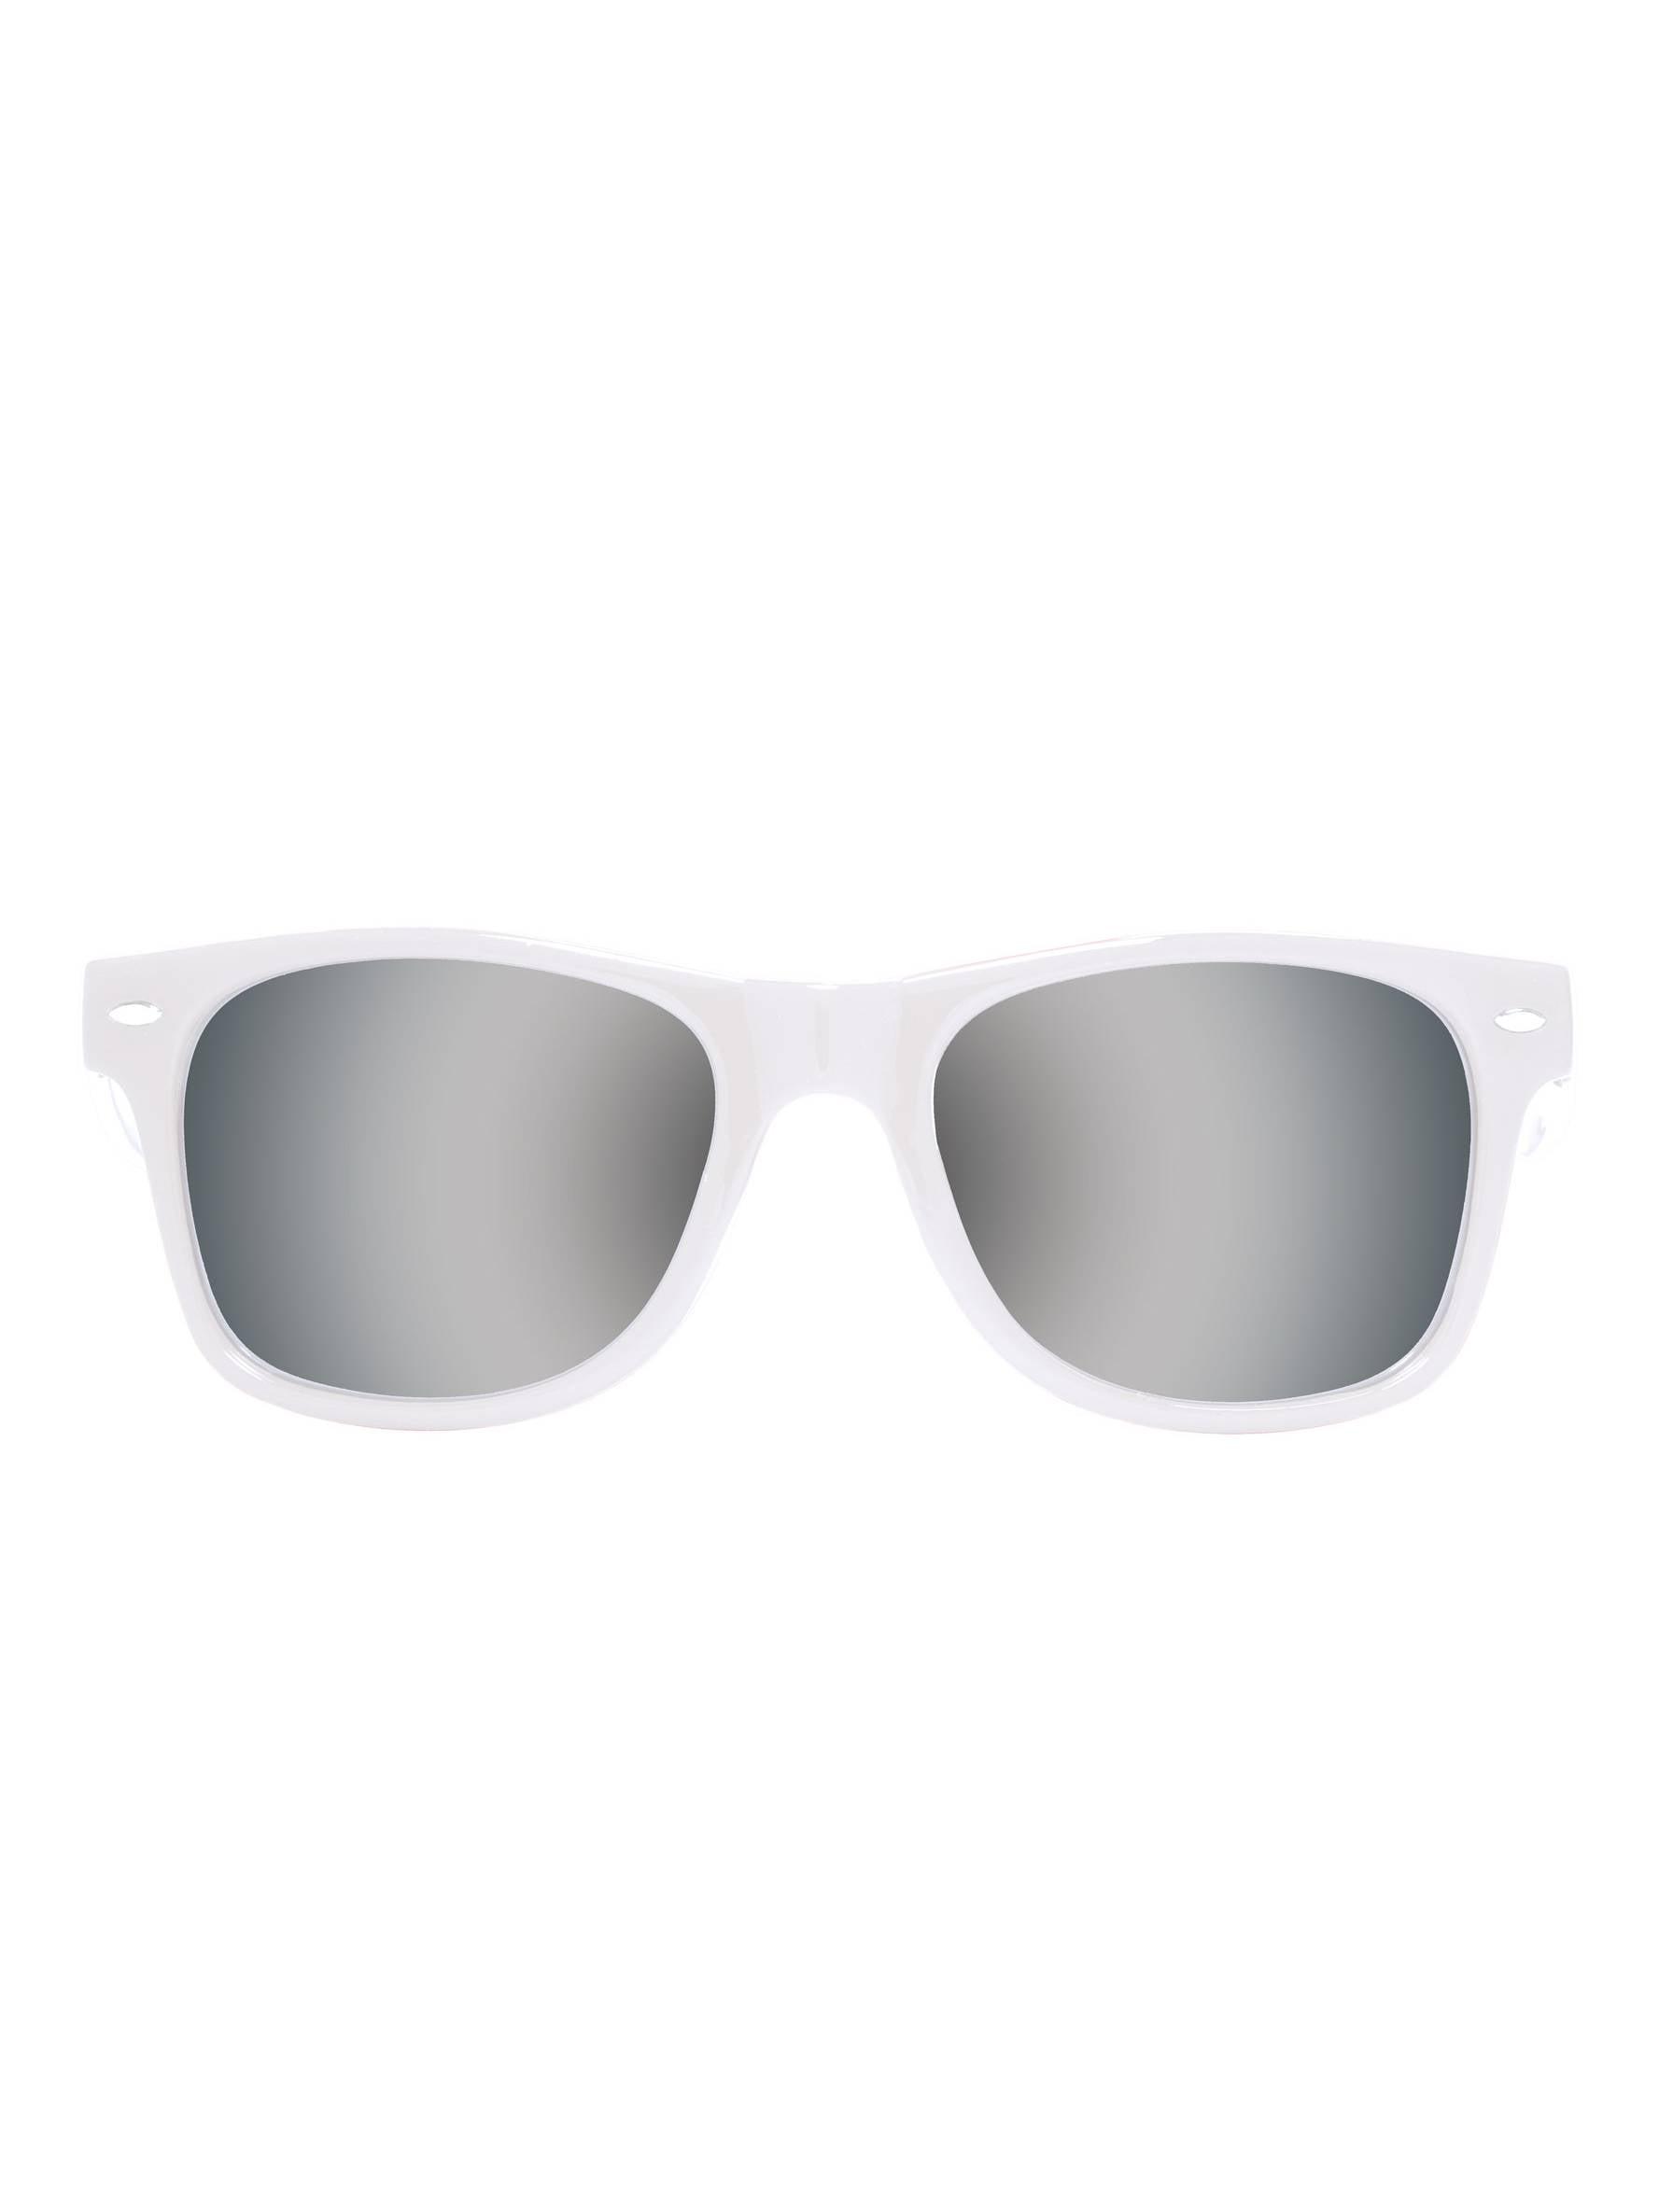 595df7d3c33 Gravity Shades - Gravity Shades Horn-Rimmed Mirror Sunglasses - Walmart.com